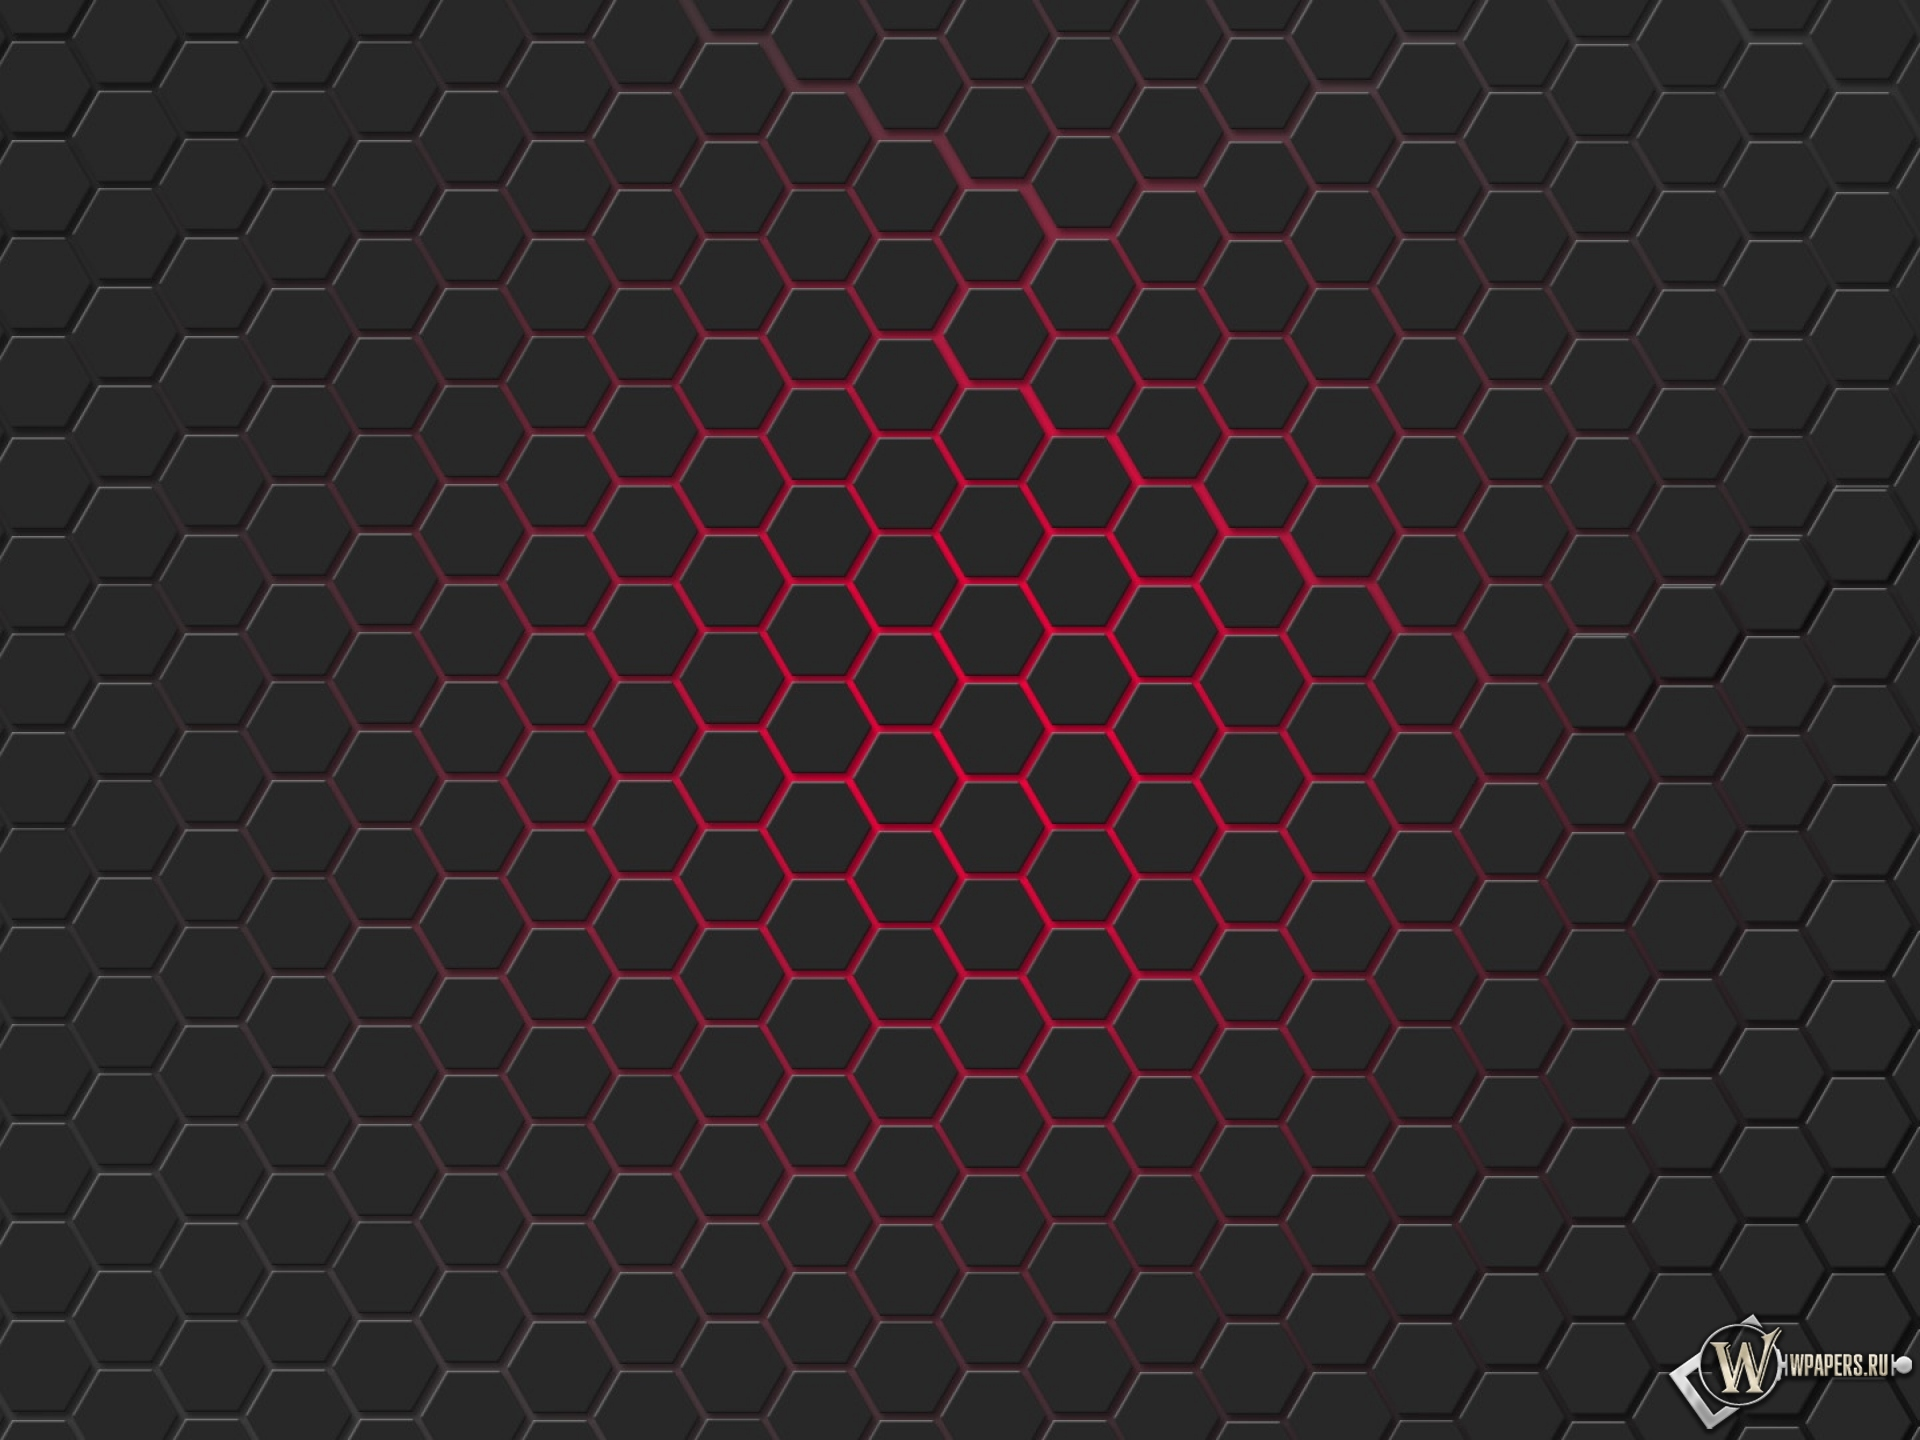 Красная гексагональная решётка 1920x1440